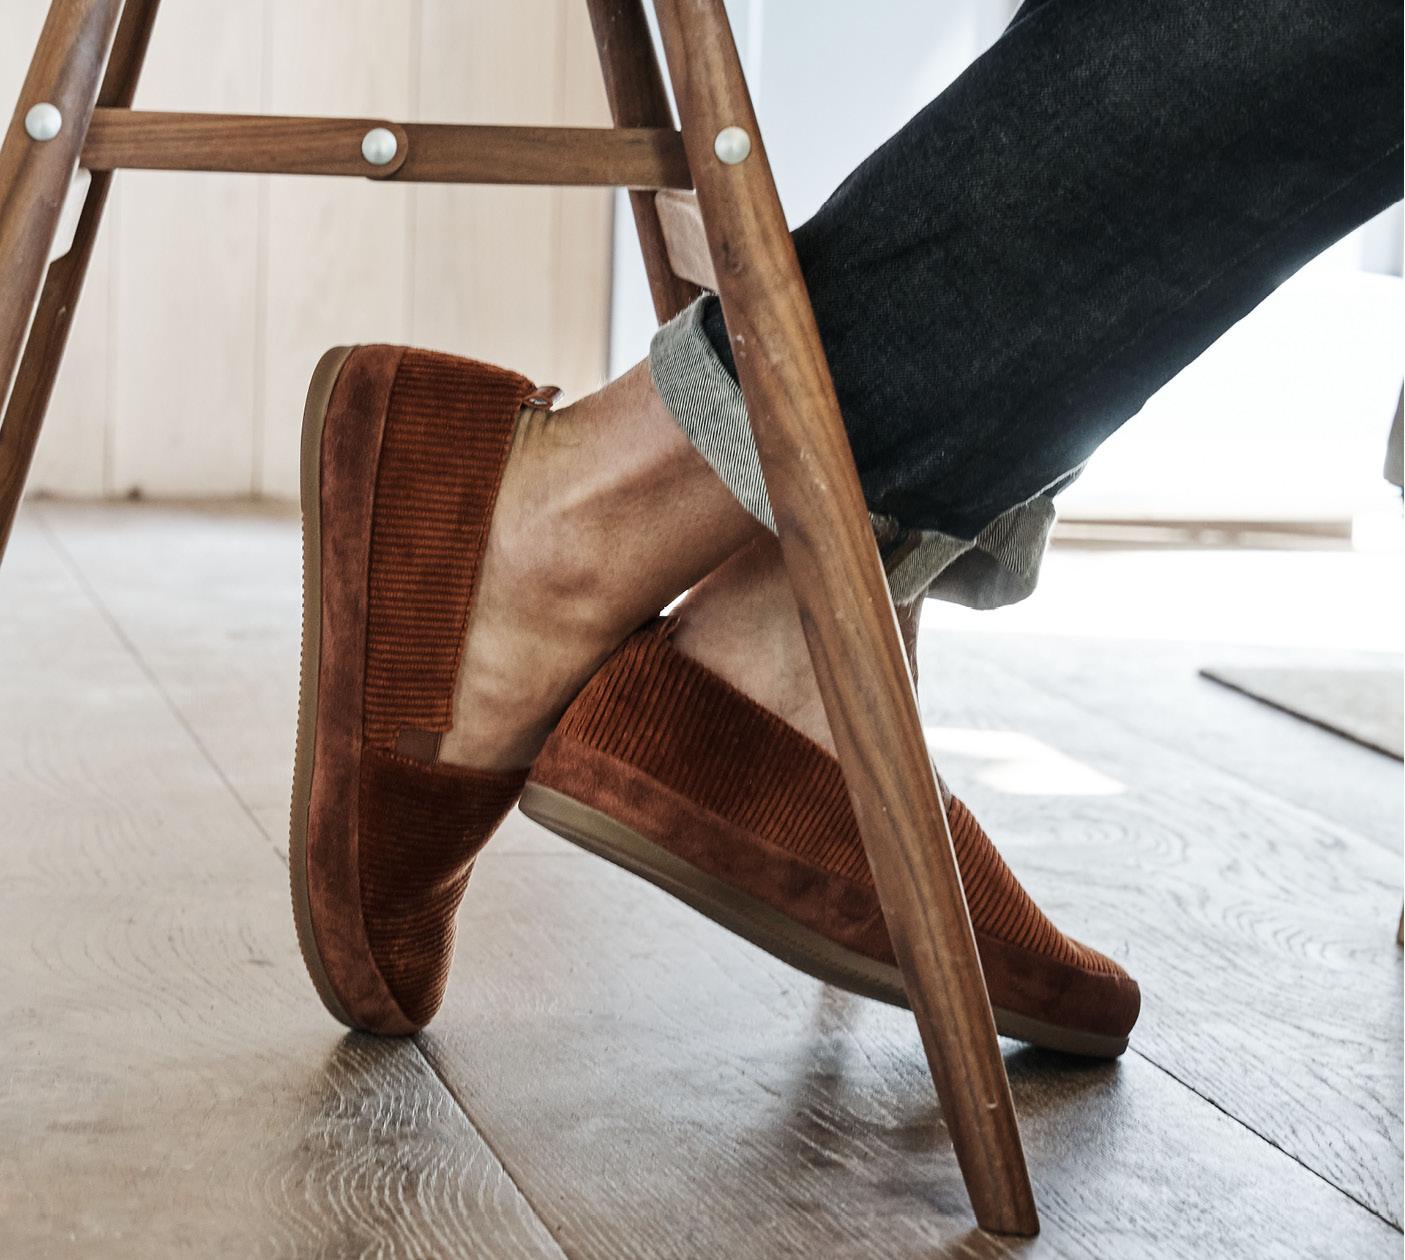 New Mens Slippers - Cognac Corduroy House Shoes